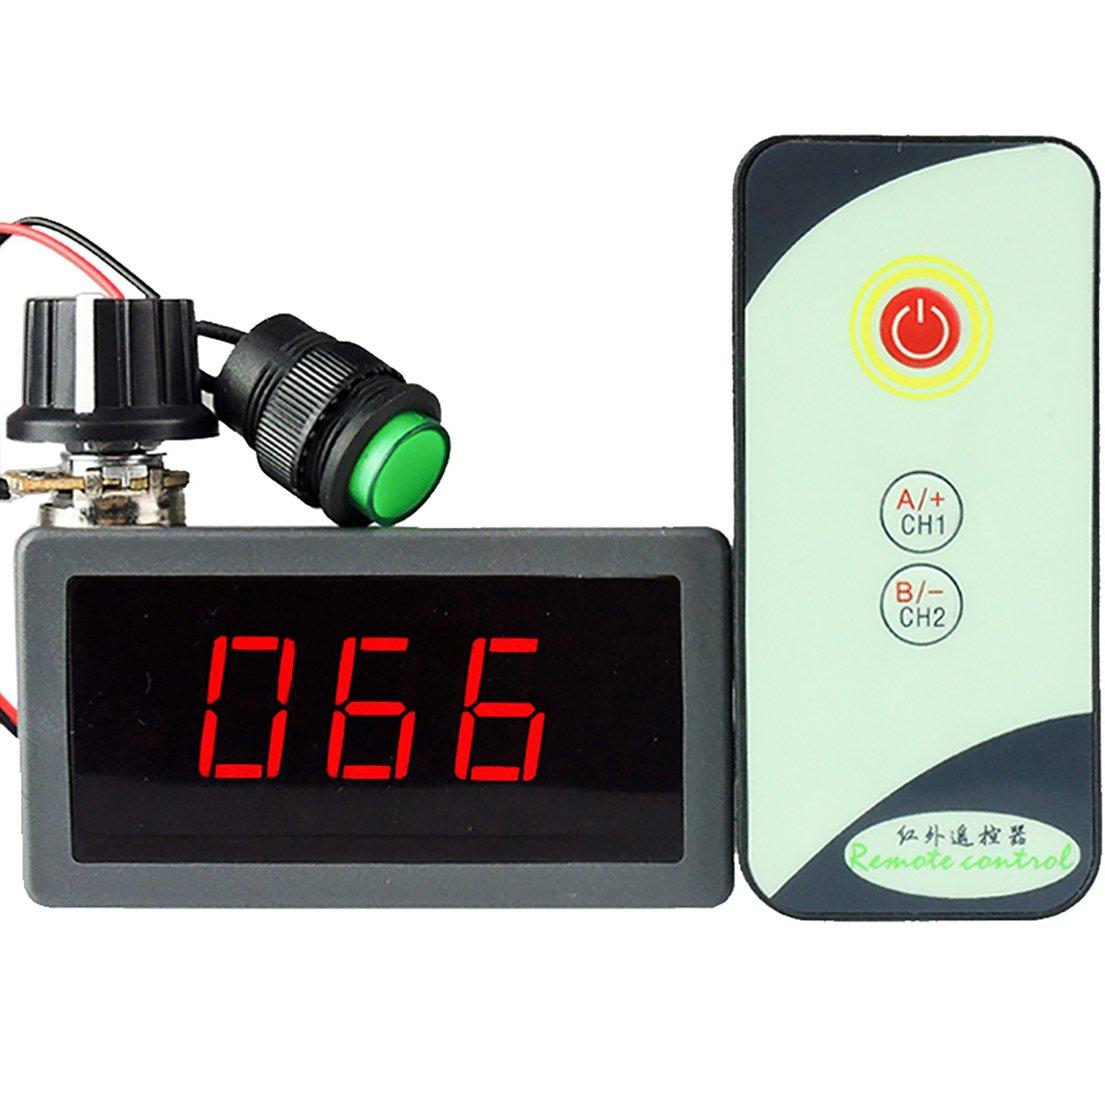 Black CCM5D Meimotong electronic Ltd uniquegoods 6V 12V 24V Digital Display LED DC Motor Speed Controller PWM Stepless Speed Control Switch HHO Driver